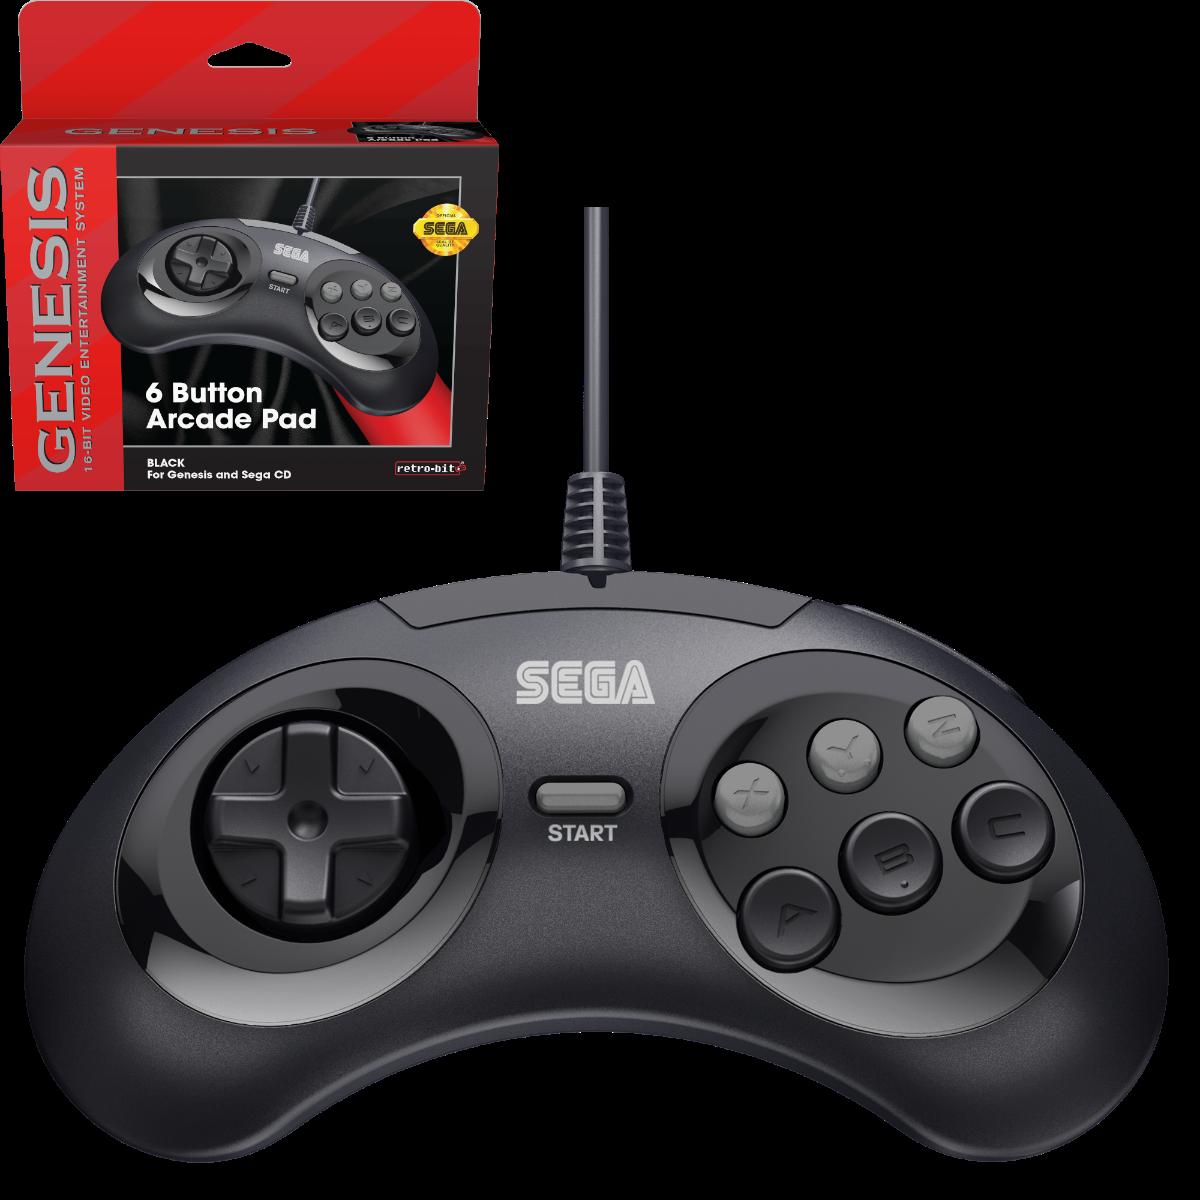 SEGA, Genesis, Arcade Pad, 6 Button, Black, Original